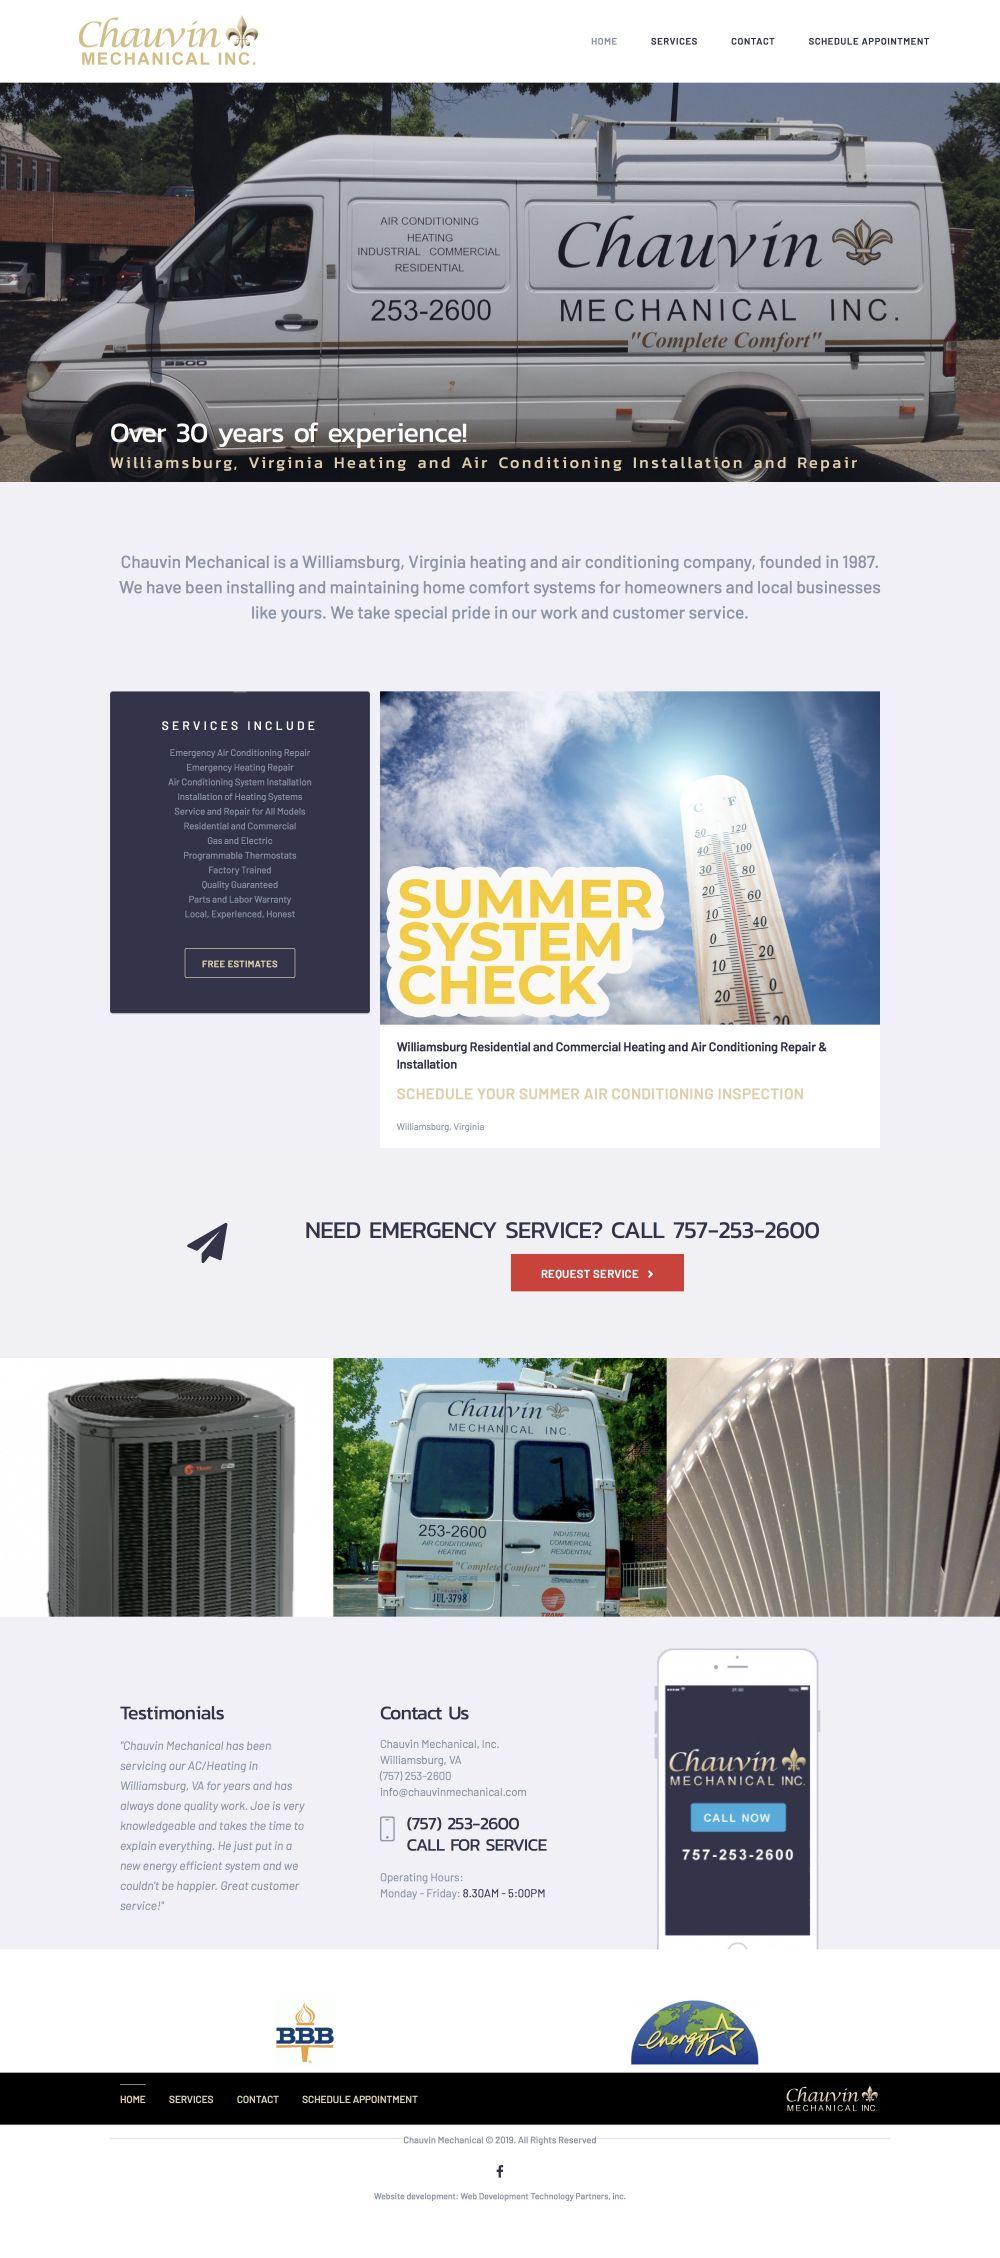 Chauvin Mechanical, Inc.